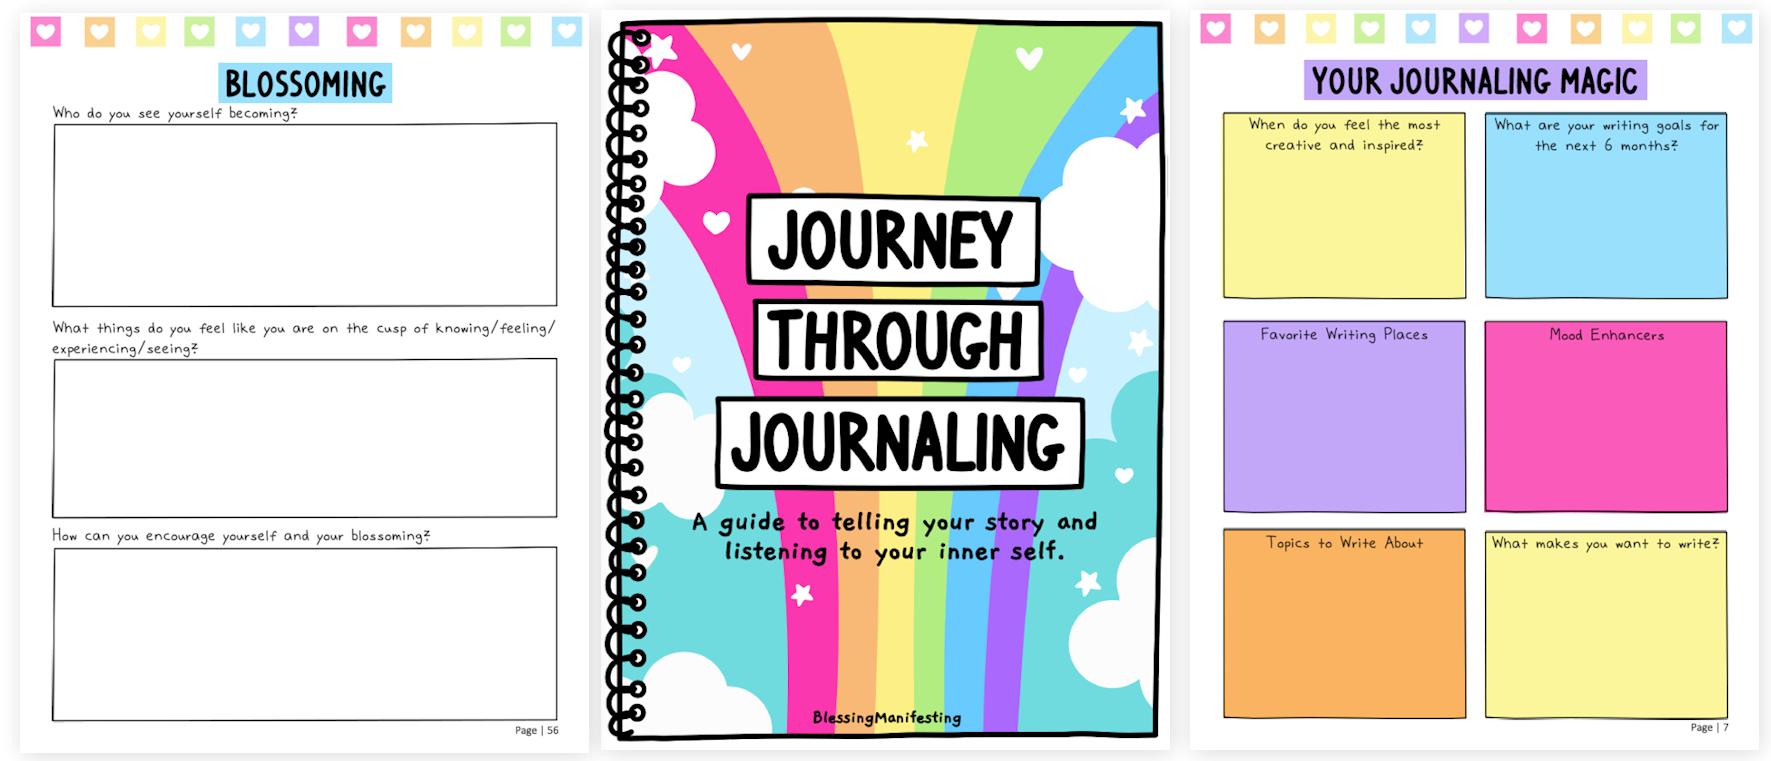 Journey through Journaling